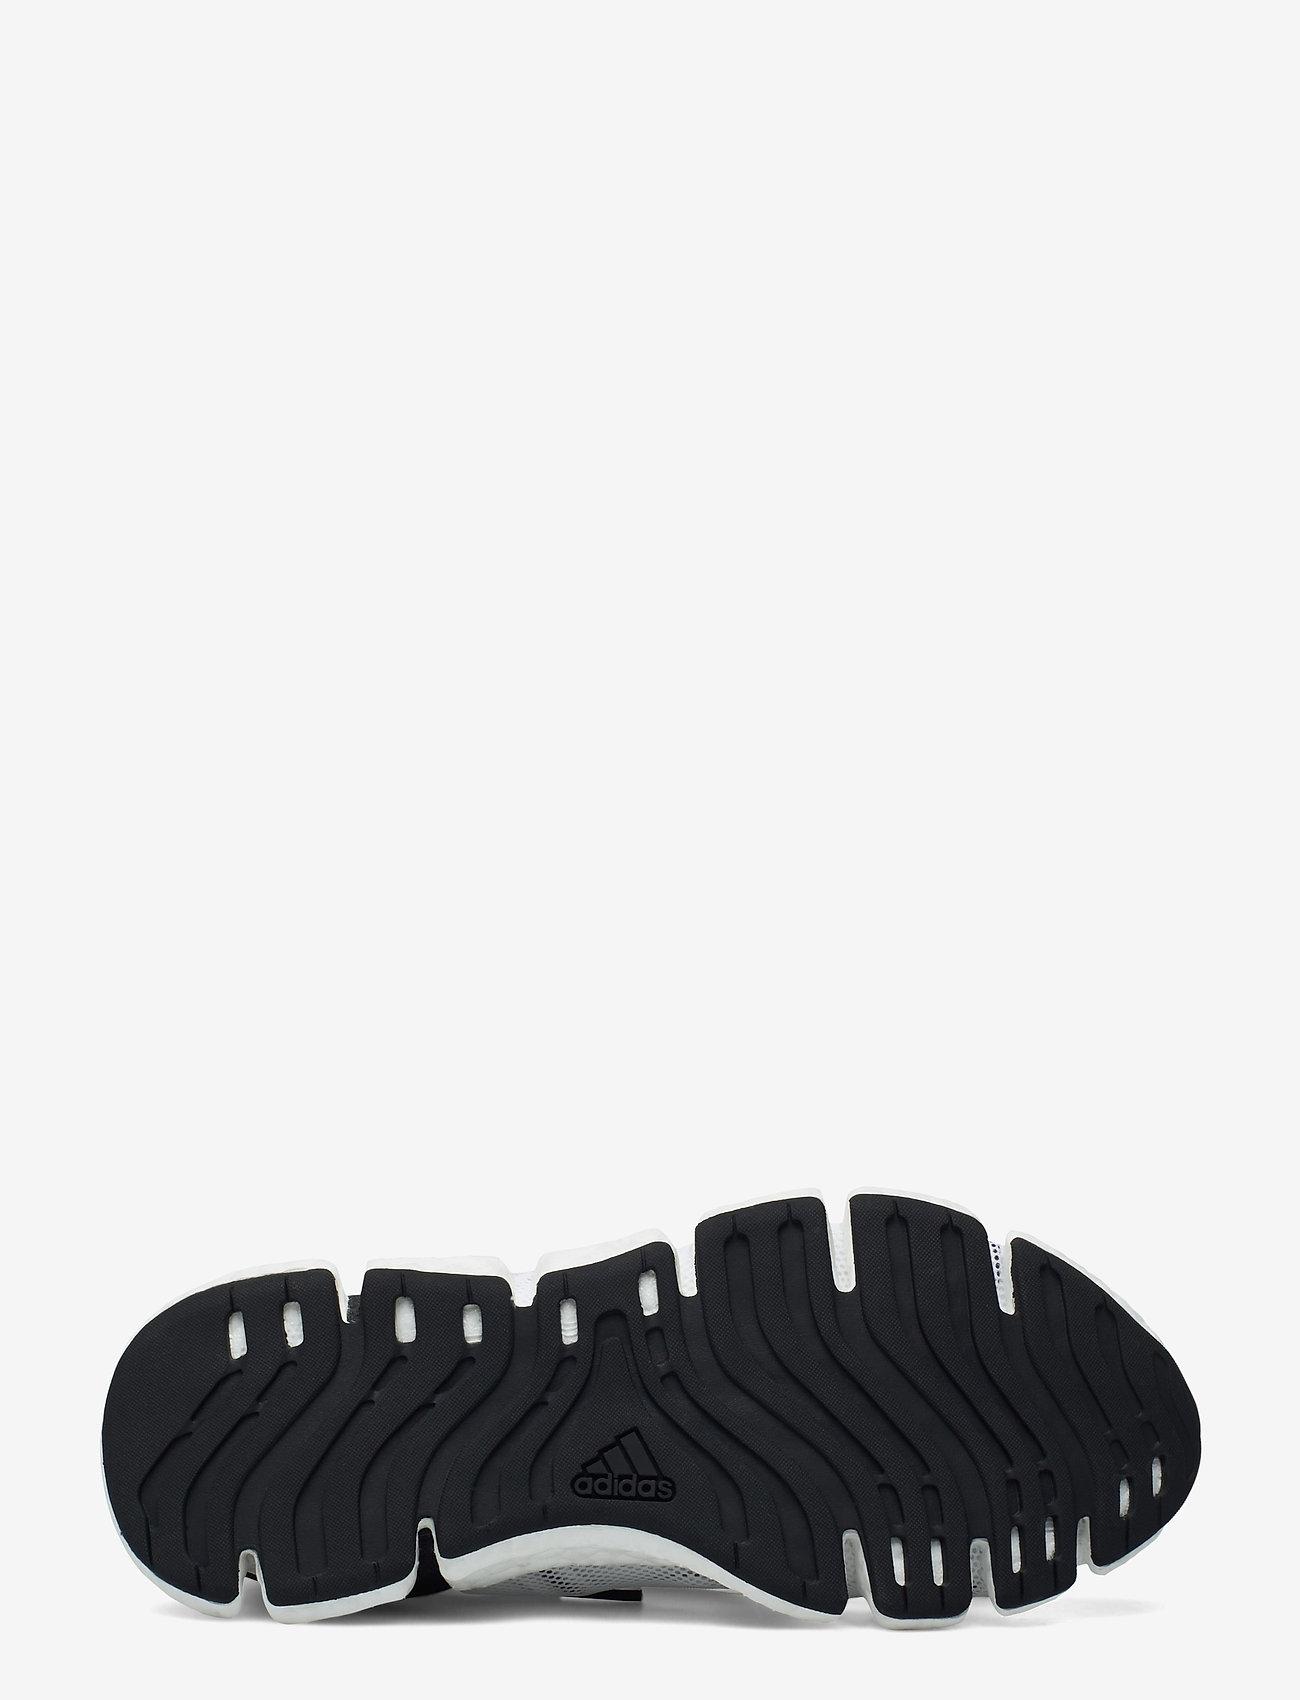 adidas by Stella McCartney - Vento W - running shoes - ftwwht/cblack/stoblu - 4